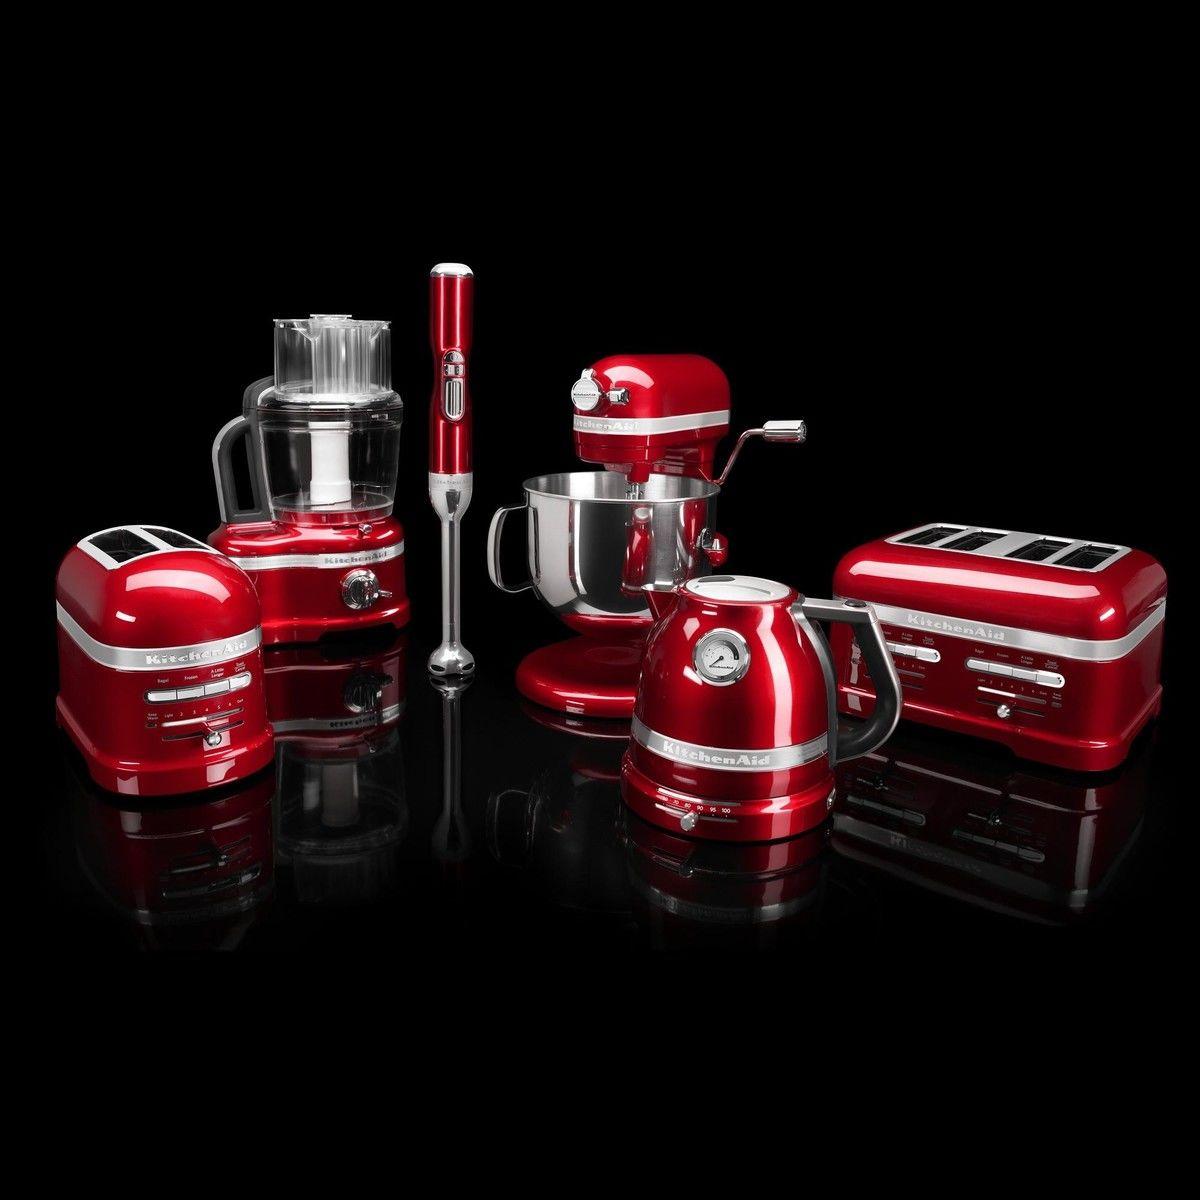 artisan 5kmt2204 toaster 2 scheiben kitchenaid. Black Bedroom Furniture Sets. Home Design Ideas